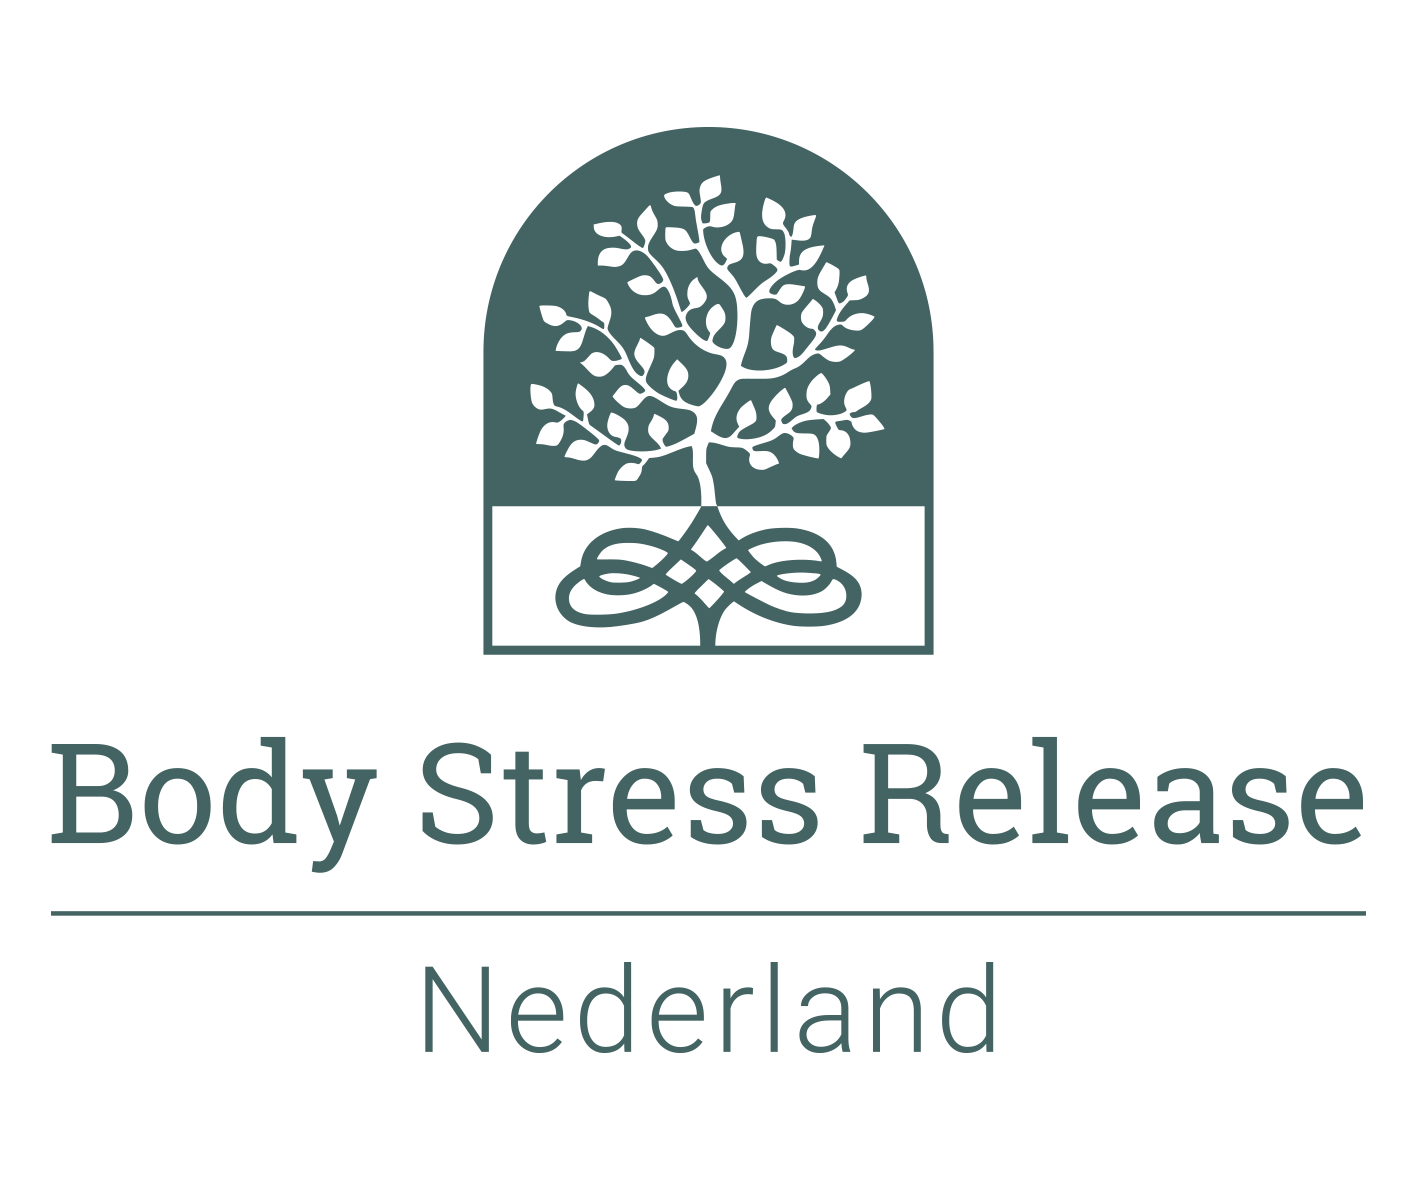 Body Stress Release Nederland